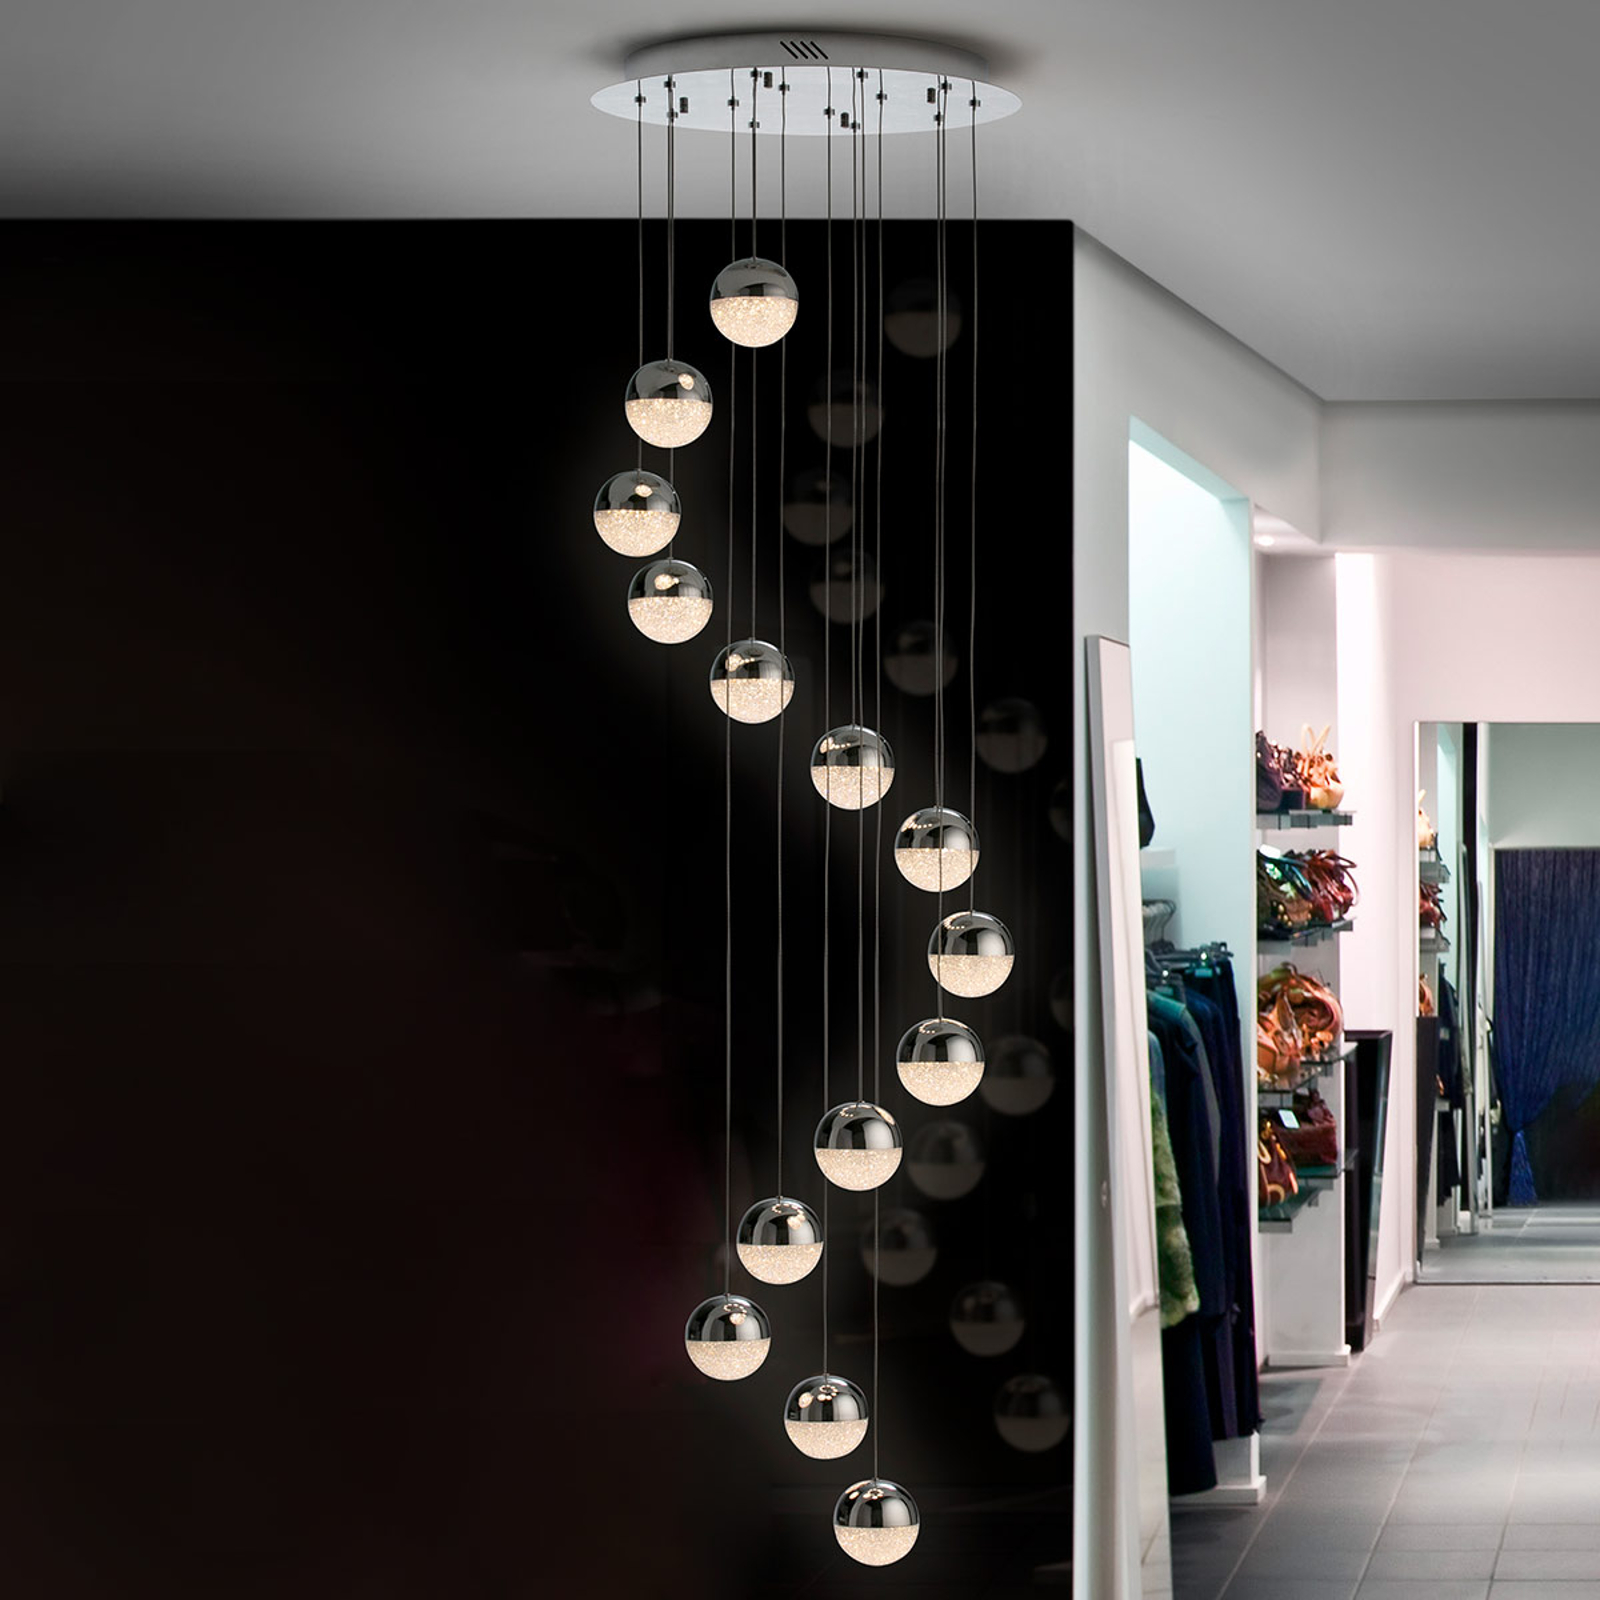 LED-pendellampa Sphere, 14 lampor, krom